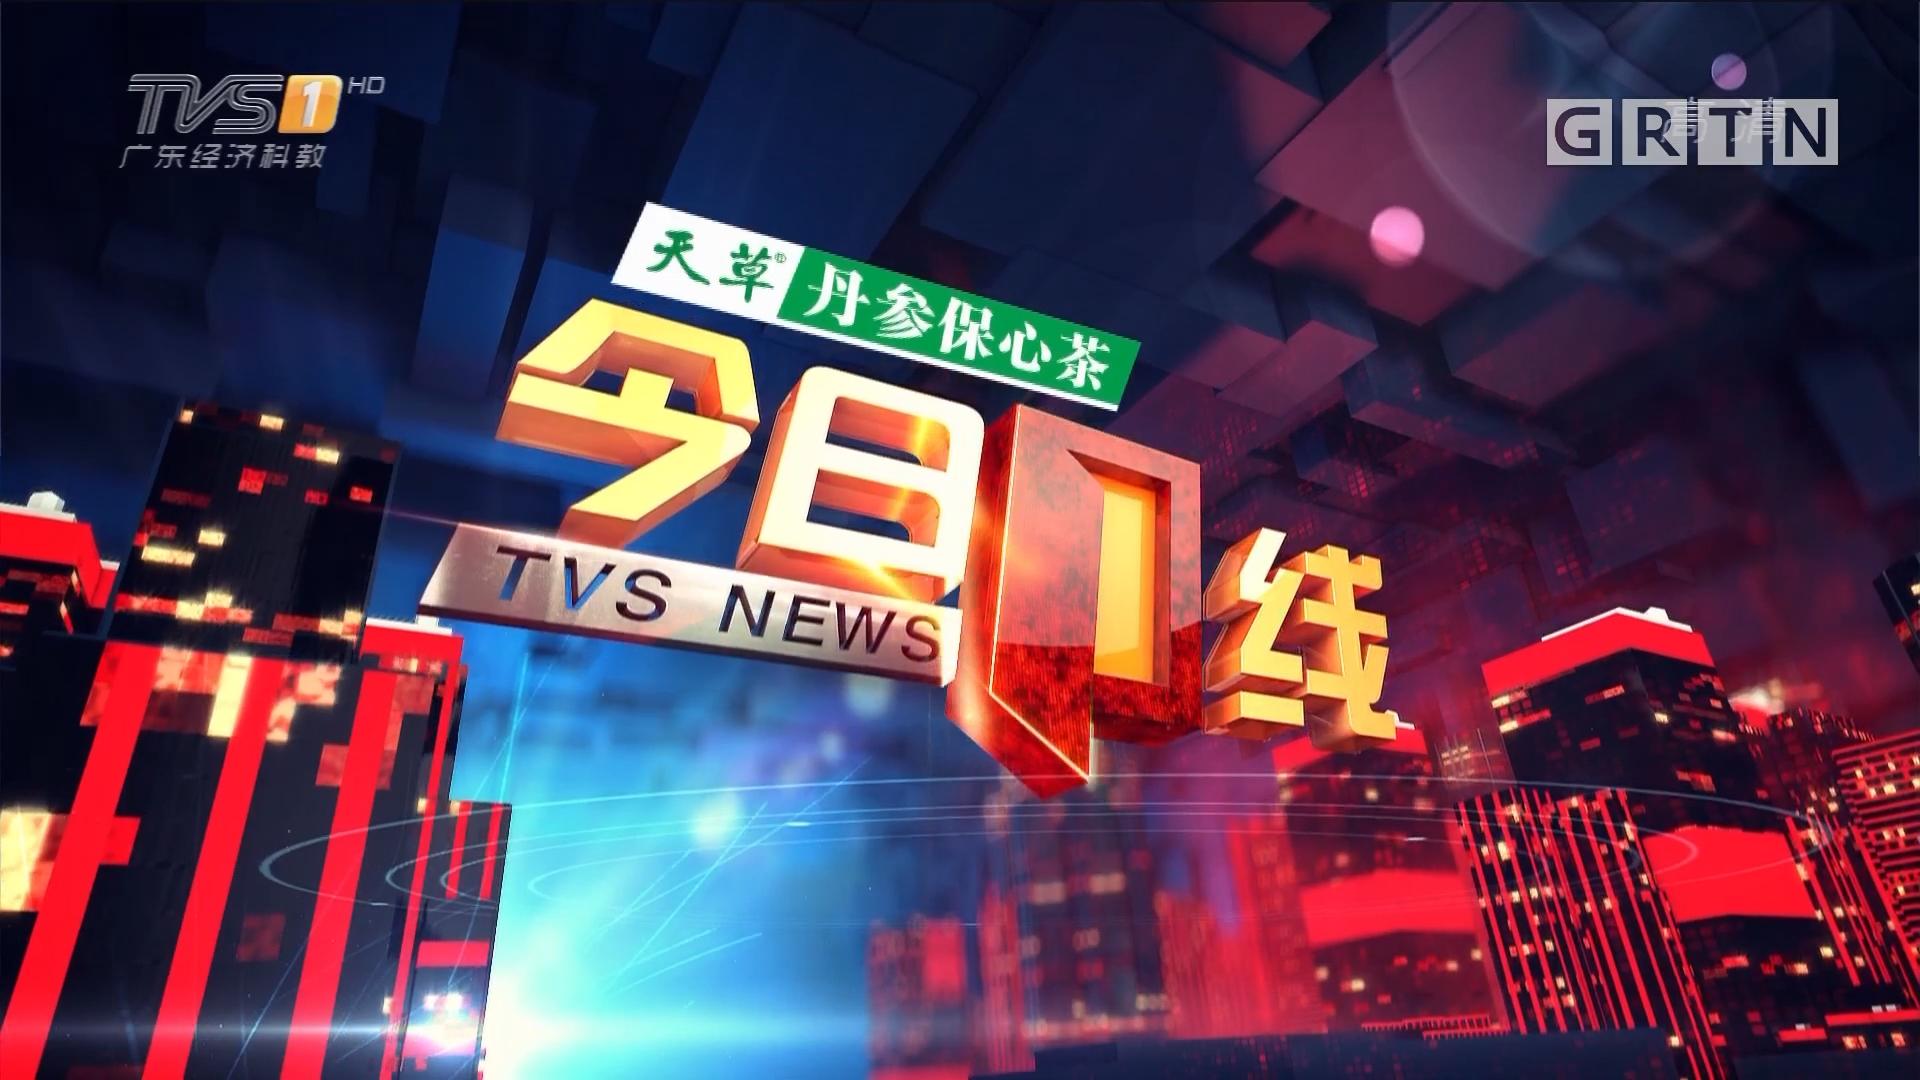 [HD][2017-11-19]今日一线:广州大学城:大学生见义勇为 奋力抓贼身中数刀